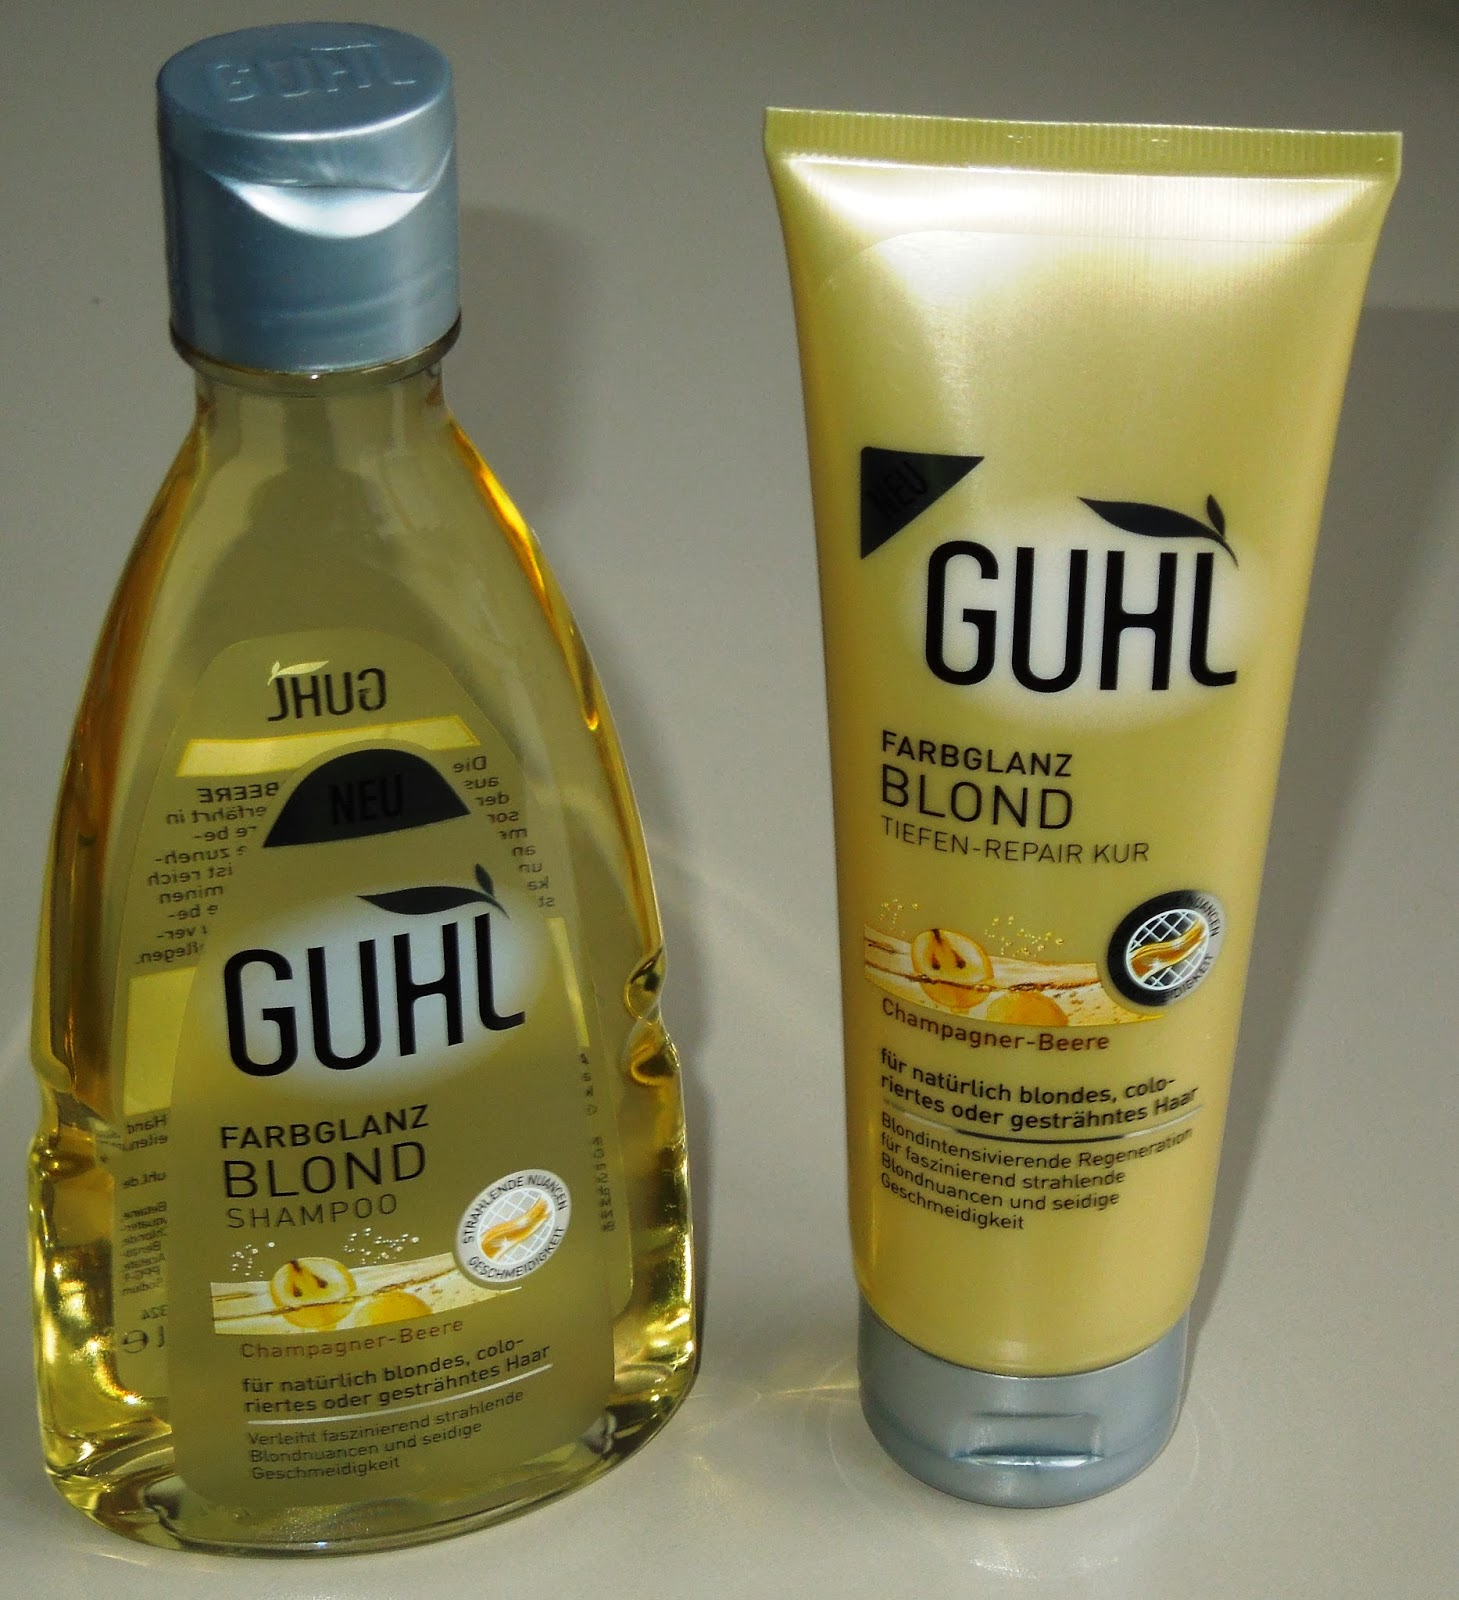 Guhl shampoo blondes haar